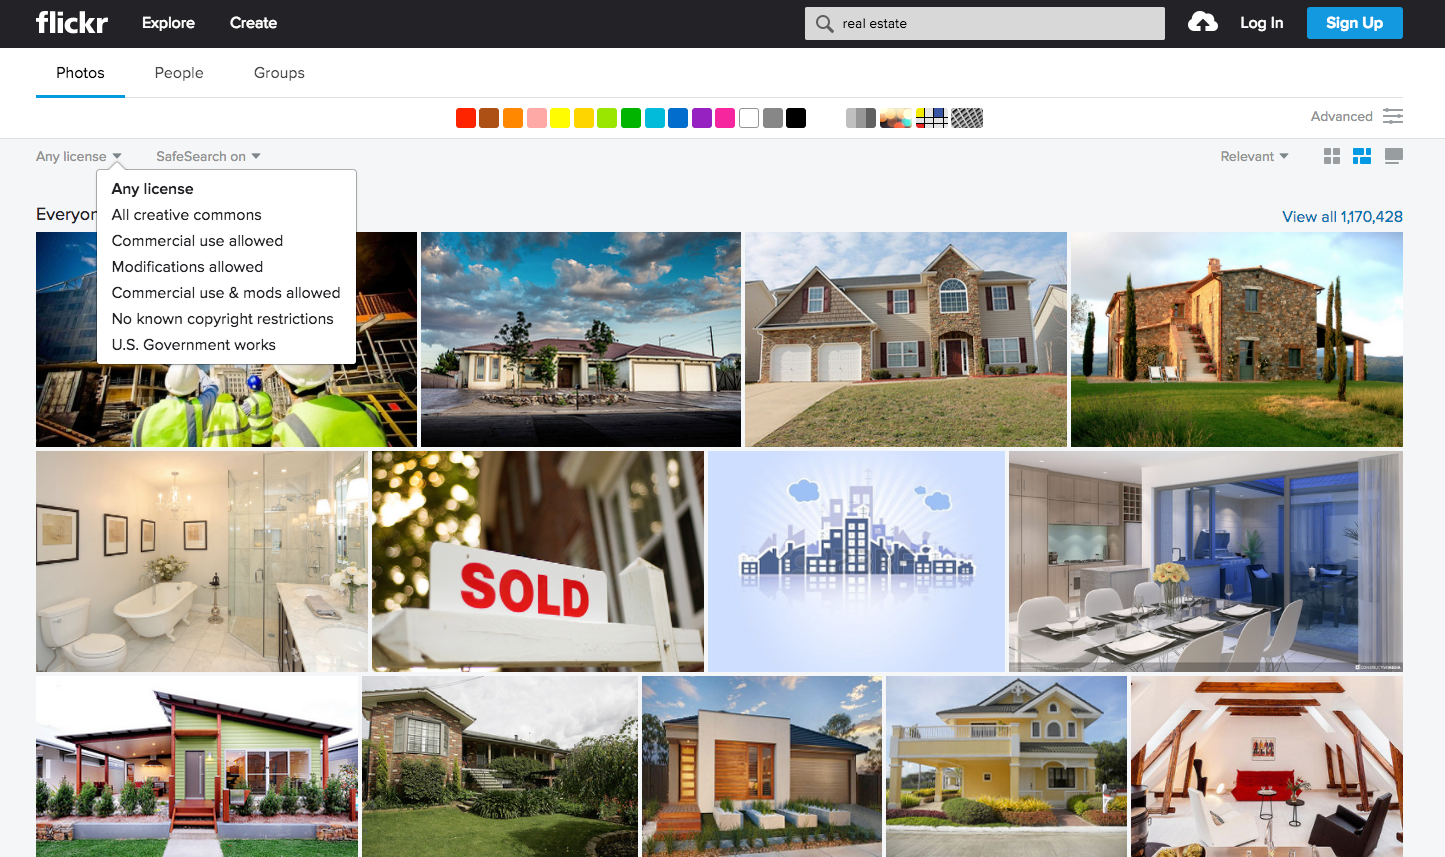 Flickr free images economic development marketing